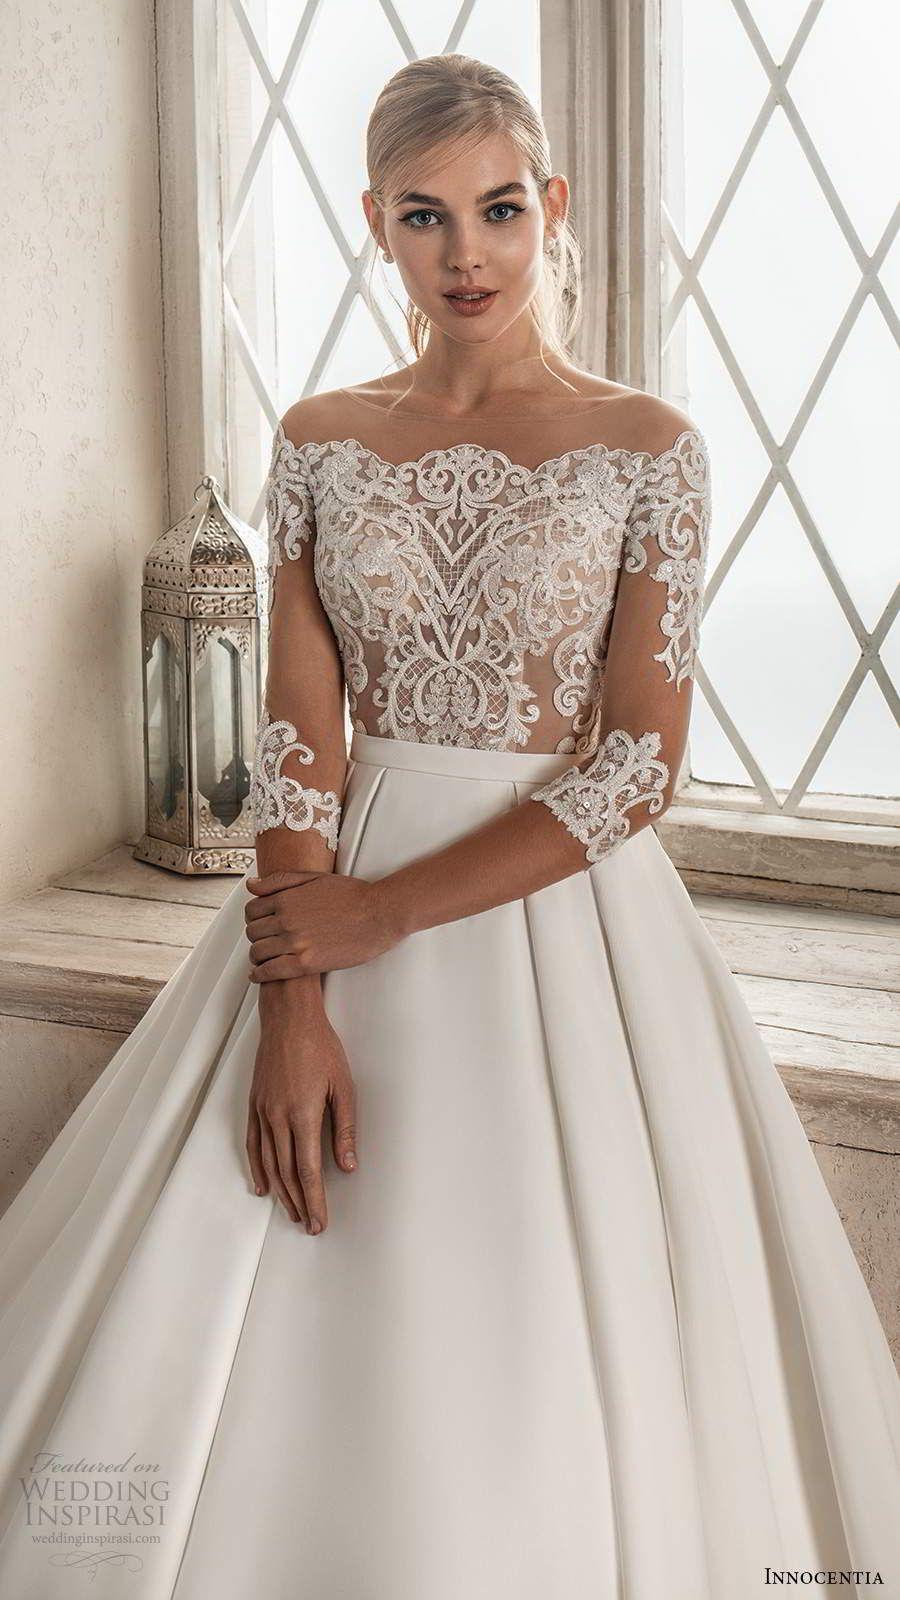 Innocentia 2021 Wedding Dresses Casablanca Bridal Collection Wedding Inspirasi Wedding Dresses Wedding Dress Types Short Lace Wedding Dress [ 1600 x 900 Pixel ]